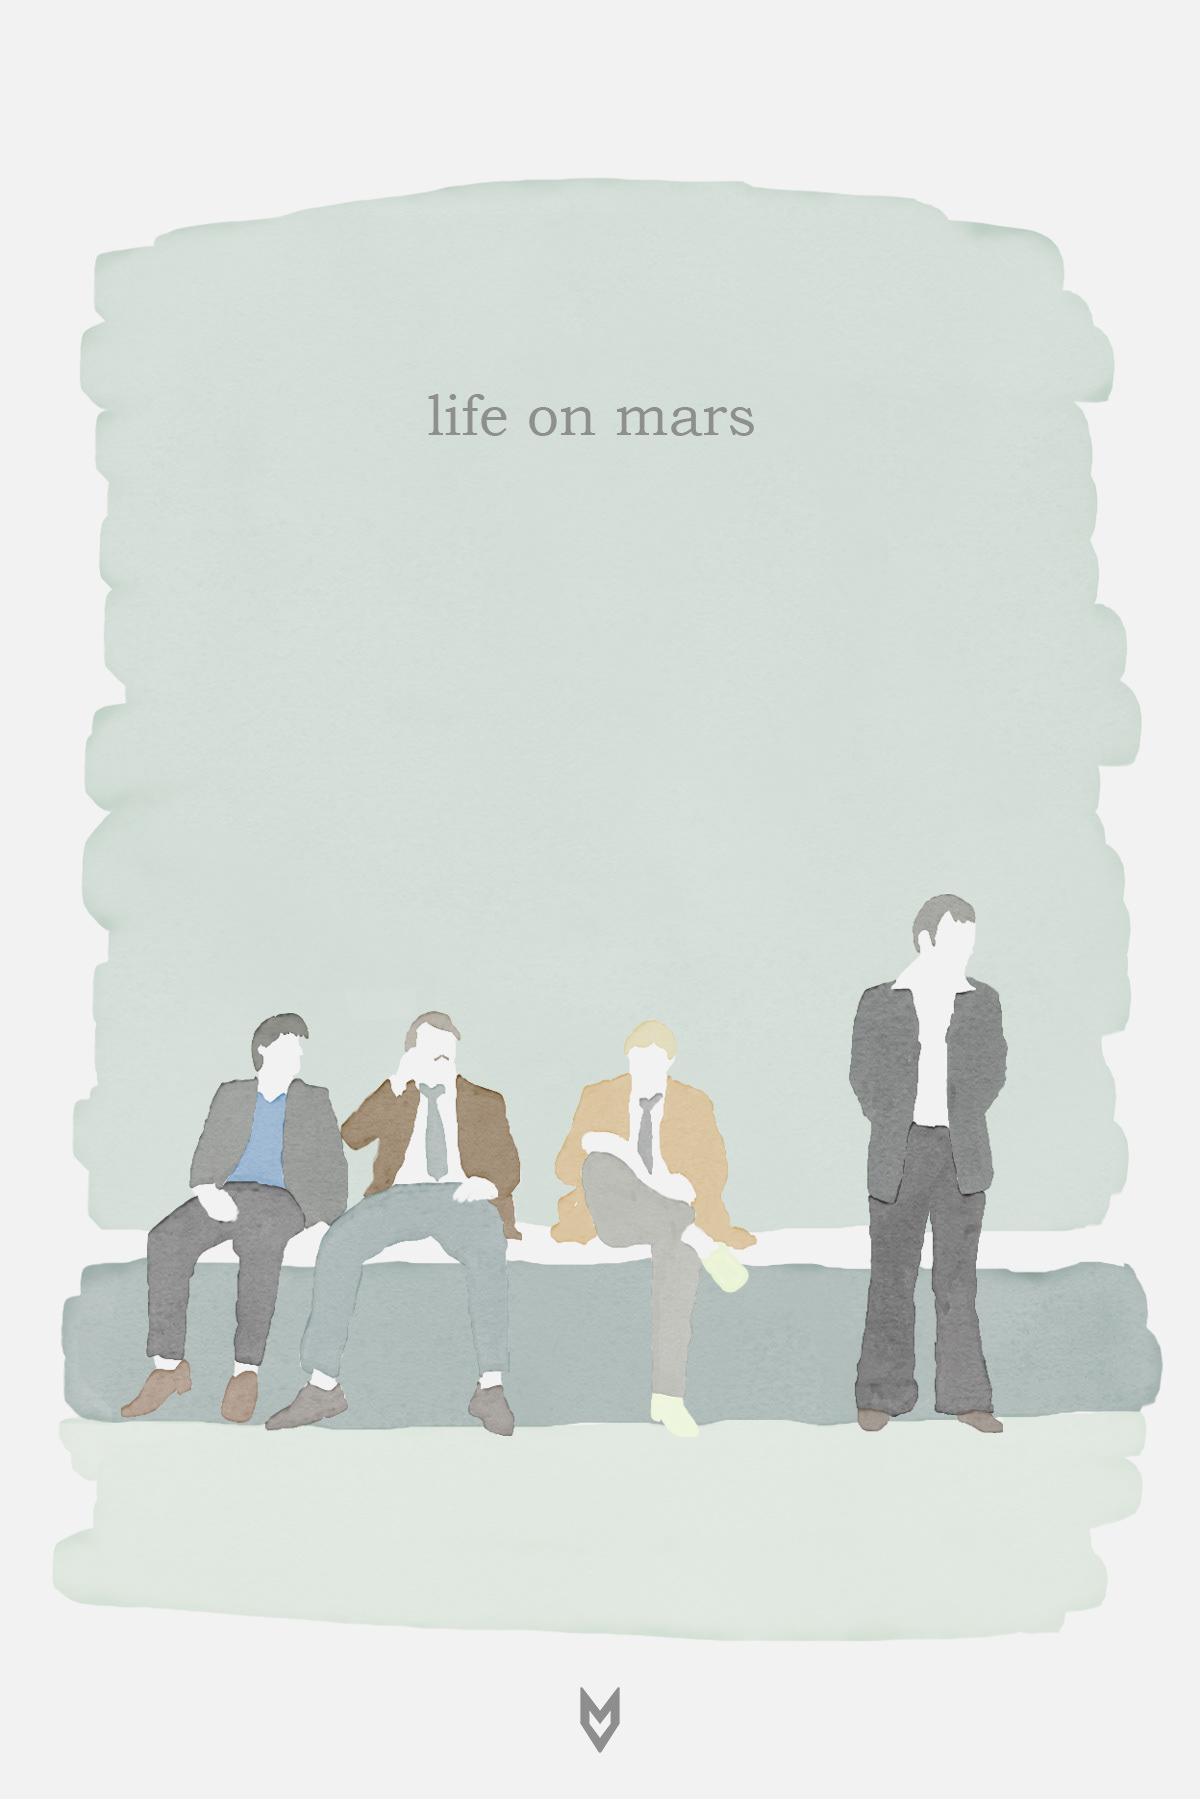 tv television Life on mars BBC ILLUSTRATION